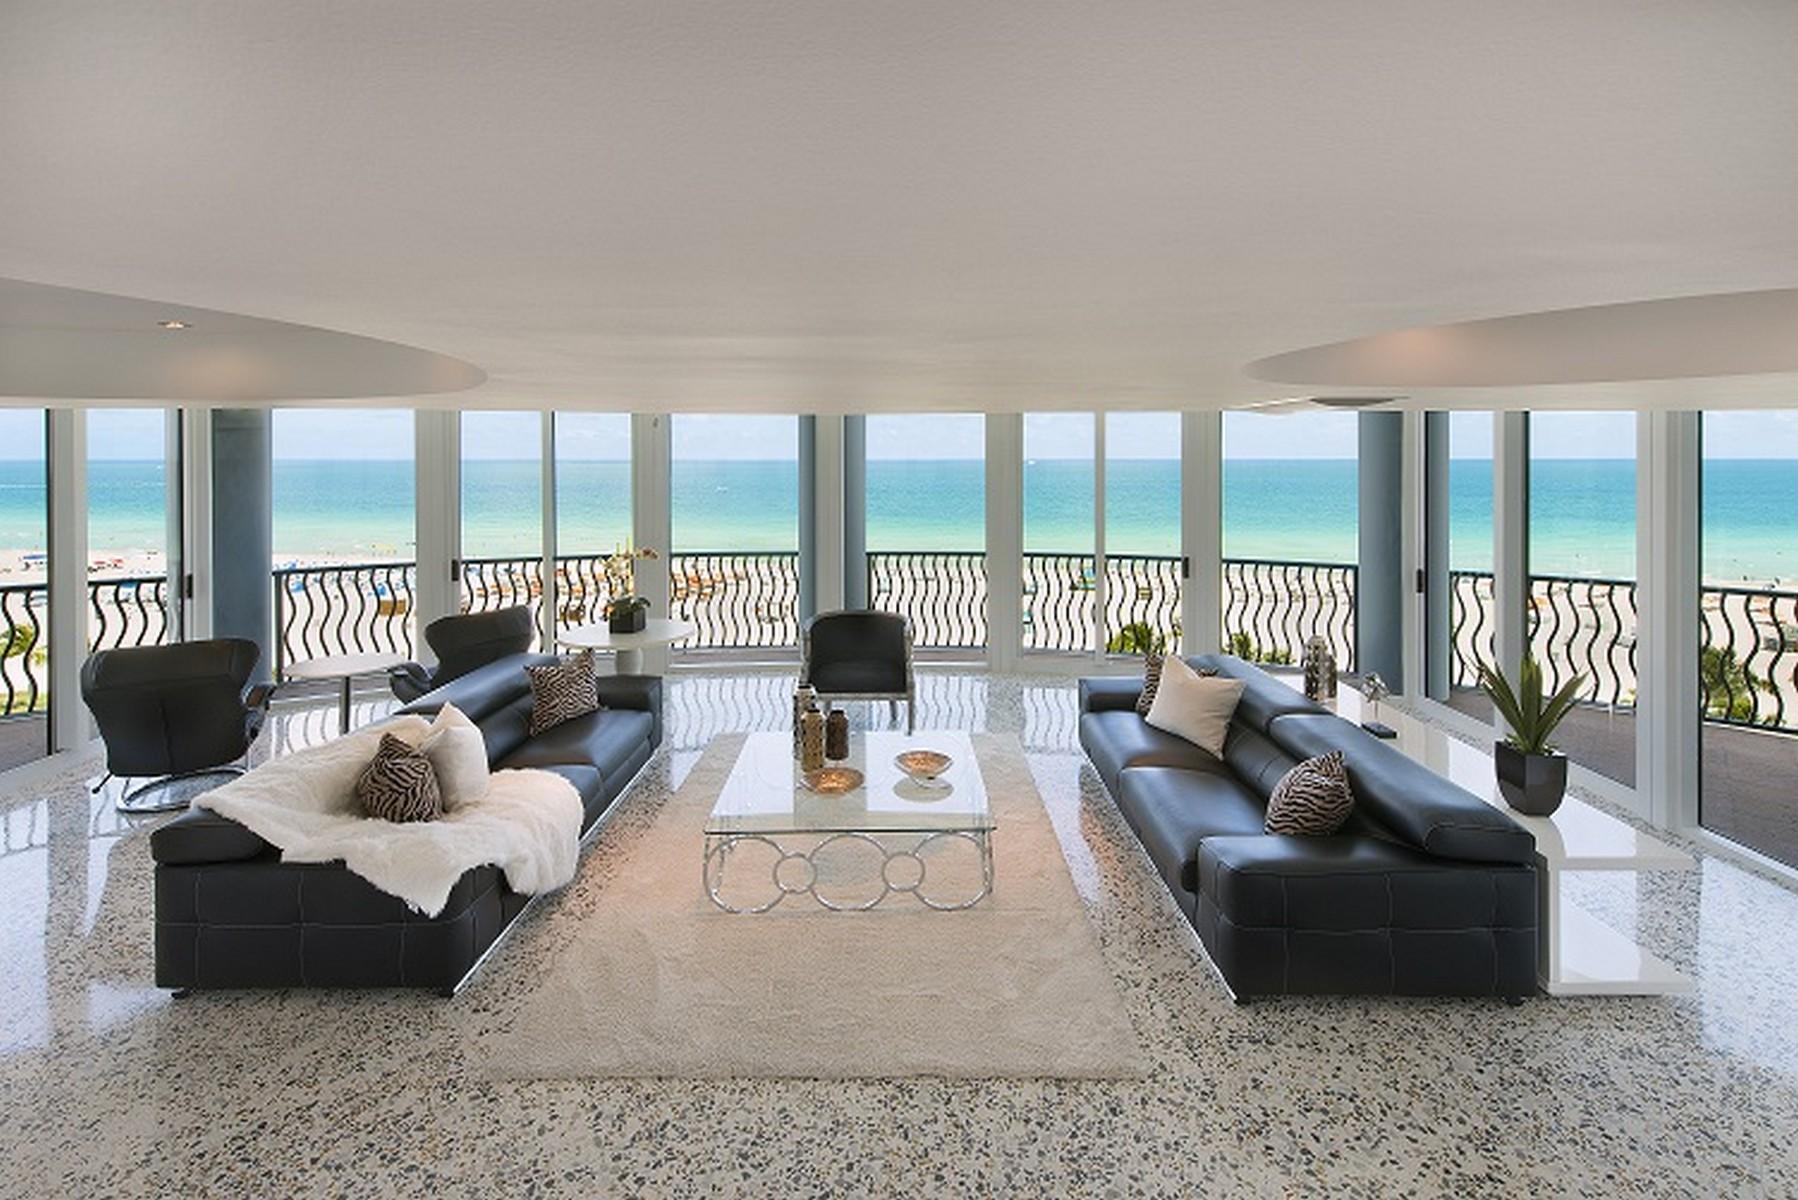 Nhà chung cư vì Bán tại 1500 Ocean Dr # 801/02 Miami Beach, Florida 33139 Hoa Kỳ